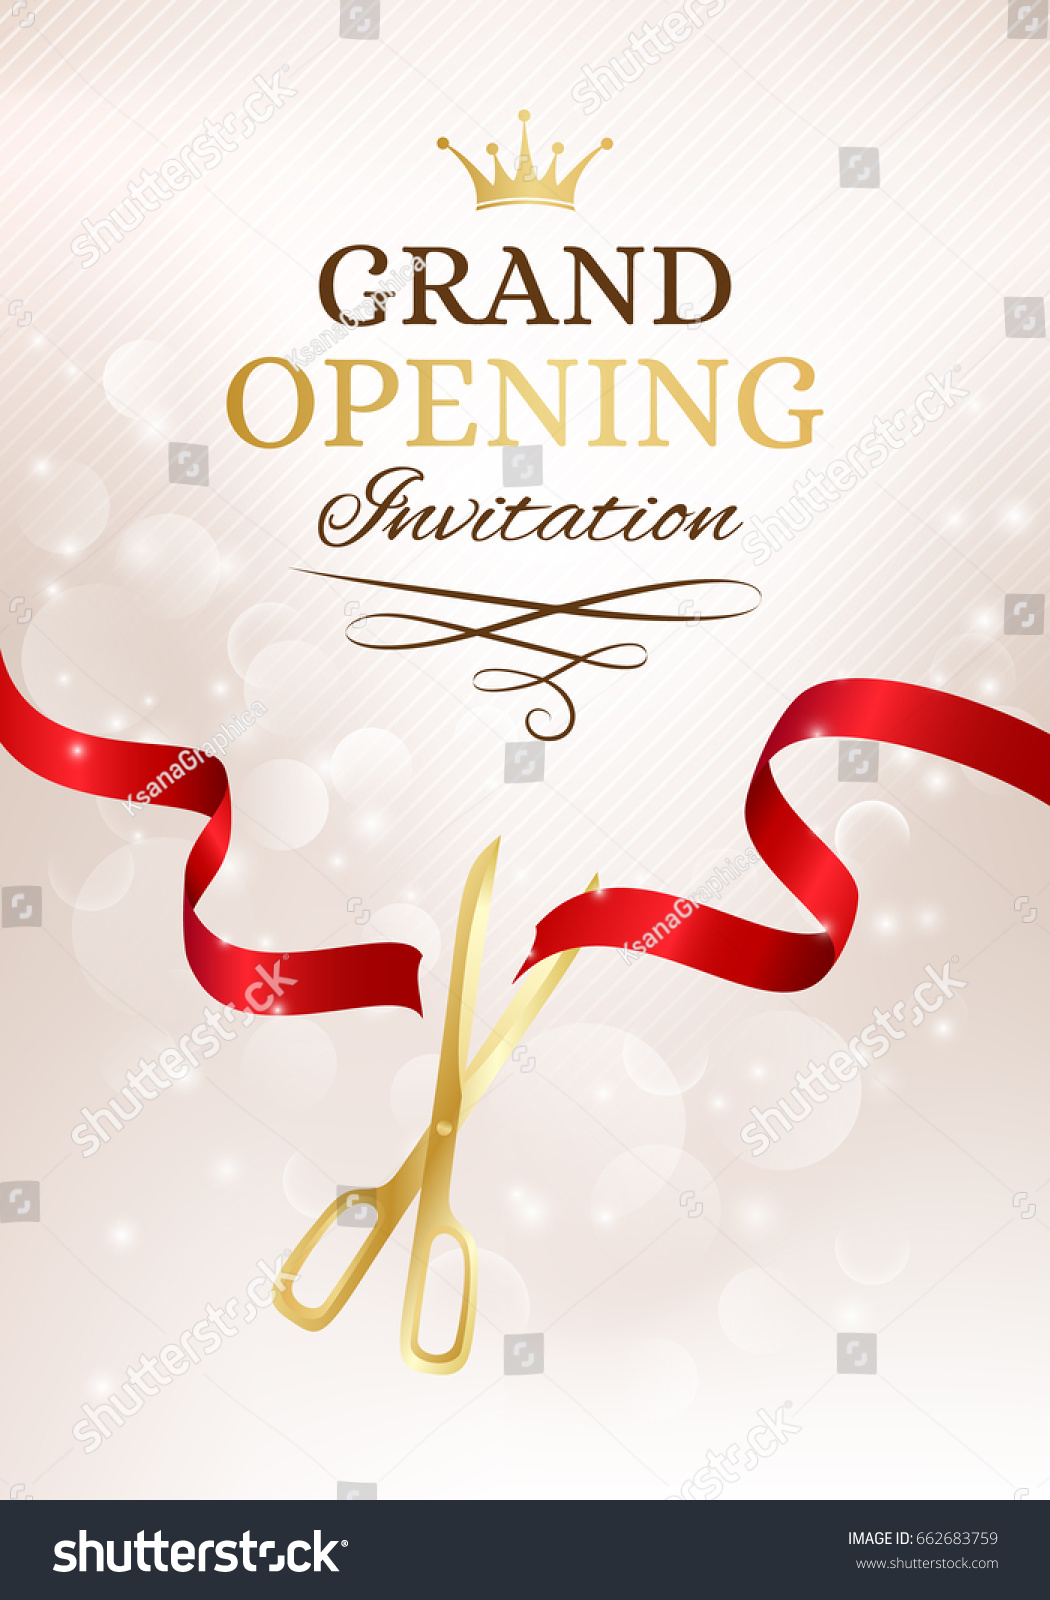 https www shutterstock com image illustration grand opening invitation card cut red 662683759